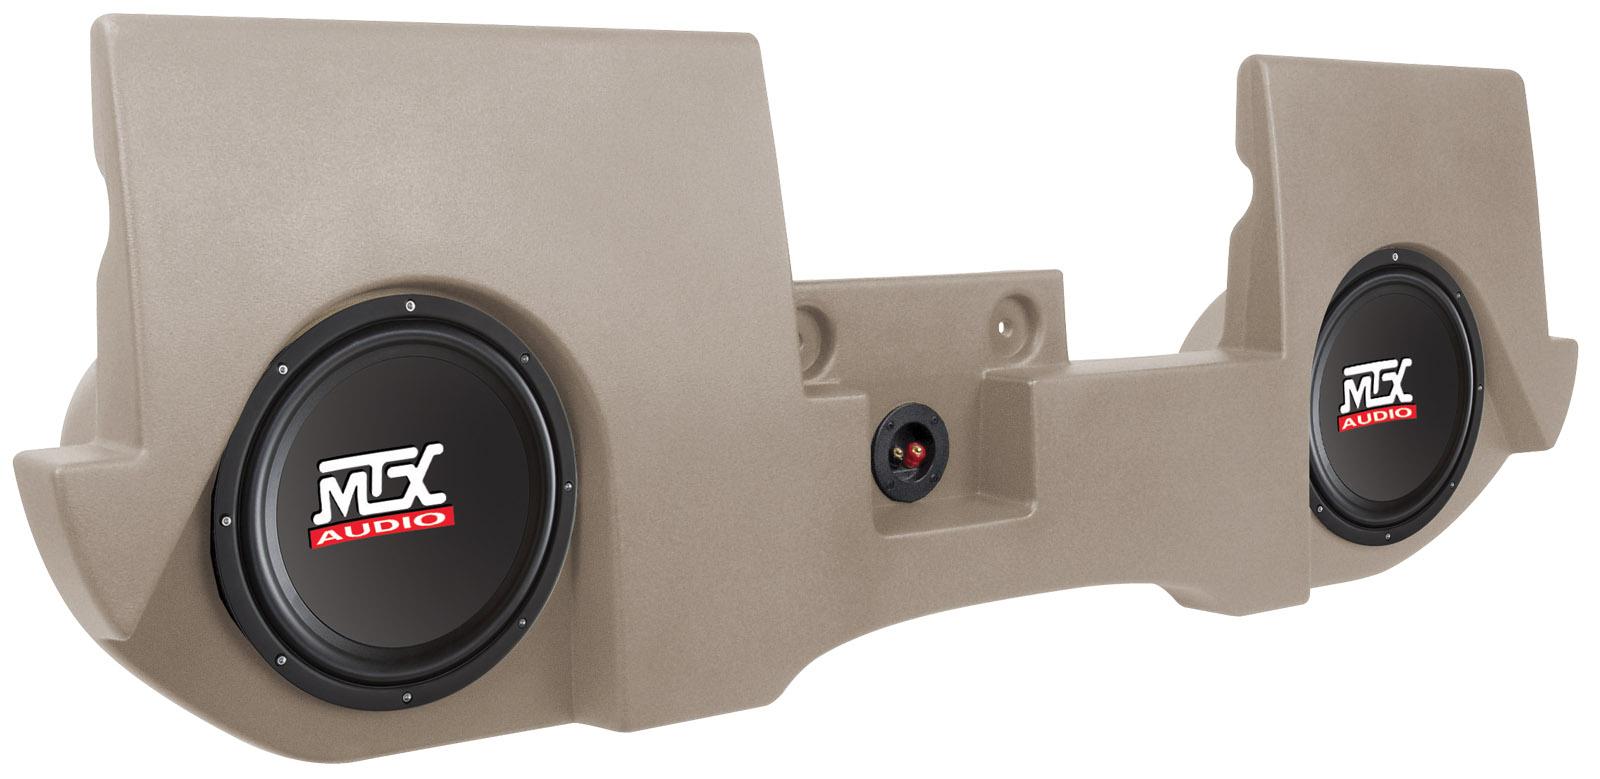 DRQC20AT-TN Thunderform Amplified Subwoofer Enclosure Dodge